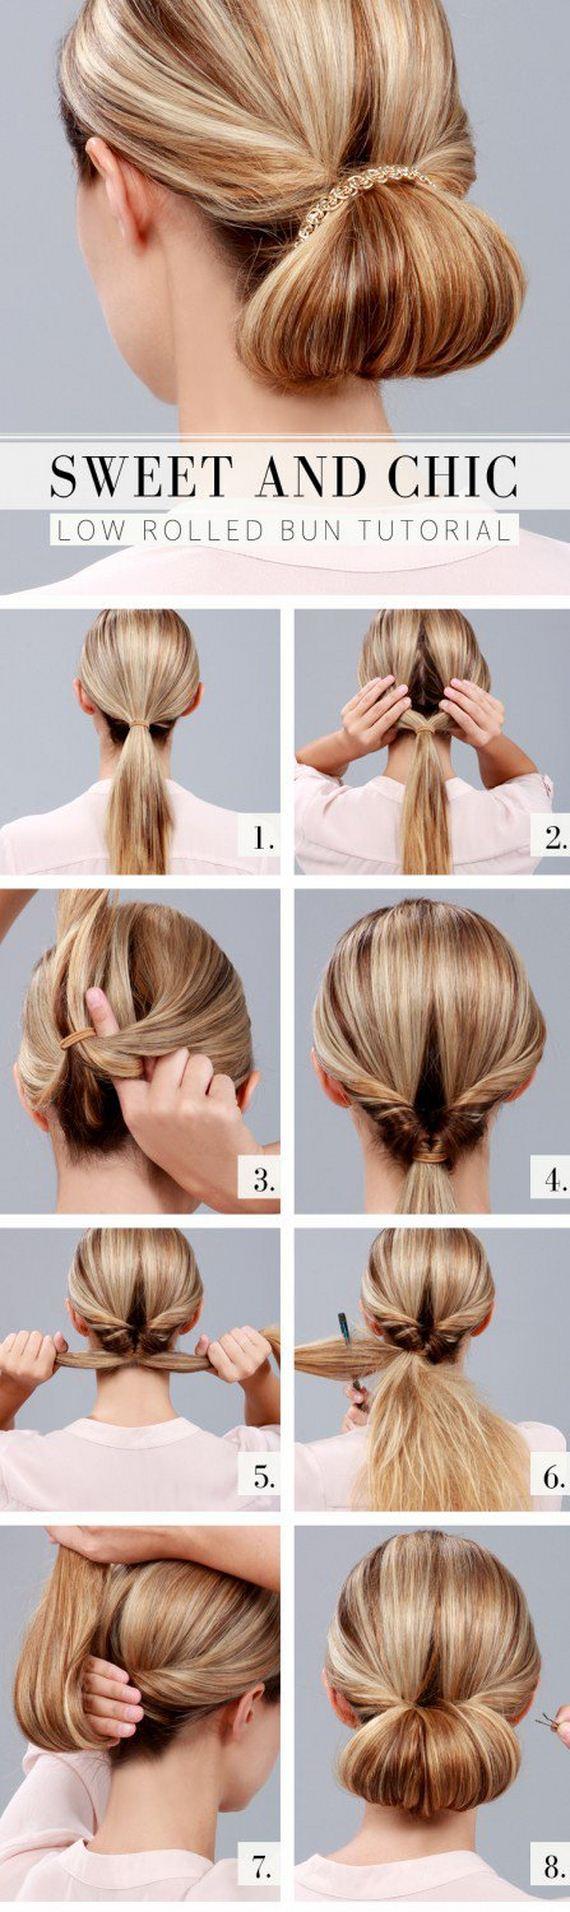 07-DIY-Hairstyles-for-Long-Hair